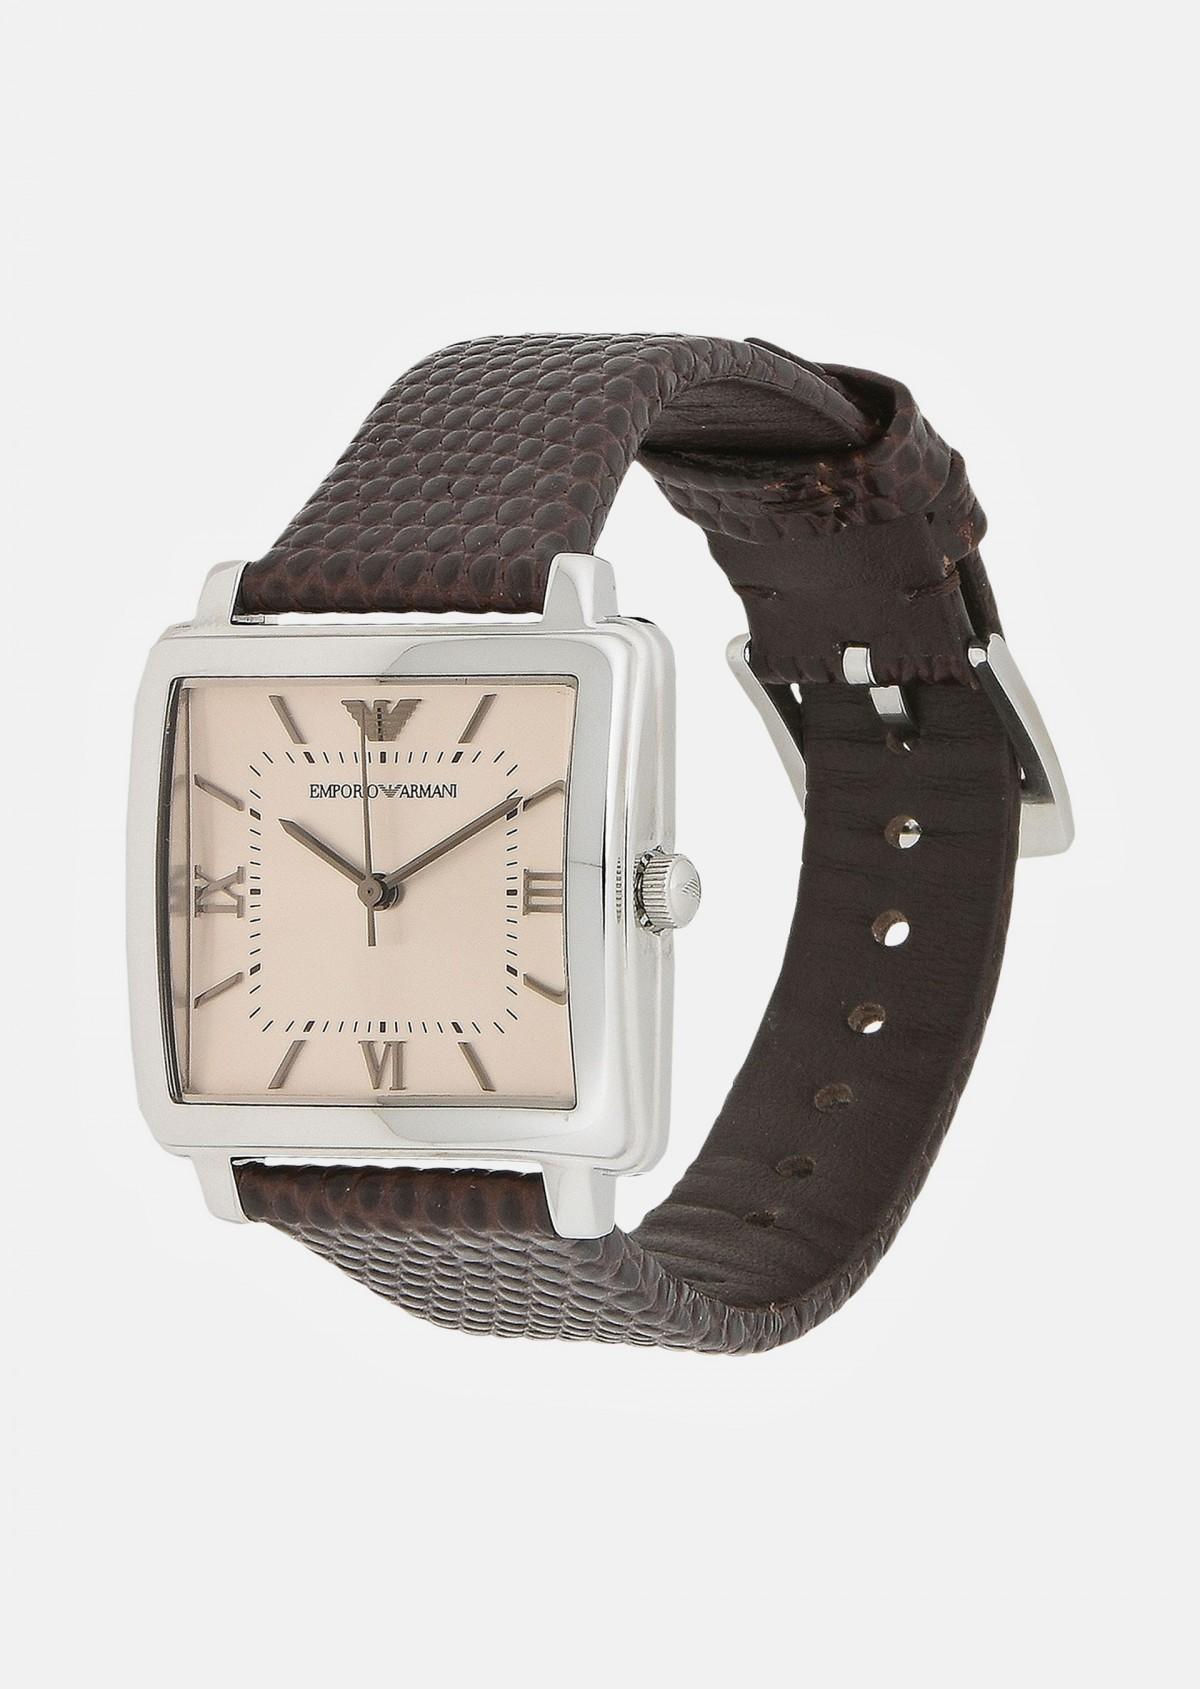 0ffbbba2de Emporio Armani 20th Anniversary Women's Watch Brown (Ar11099)